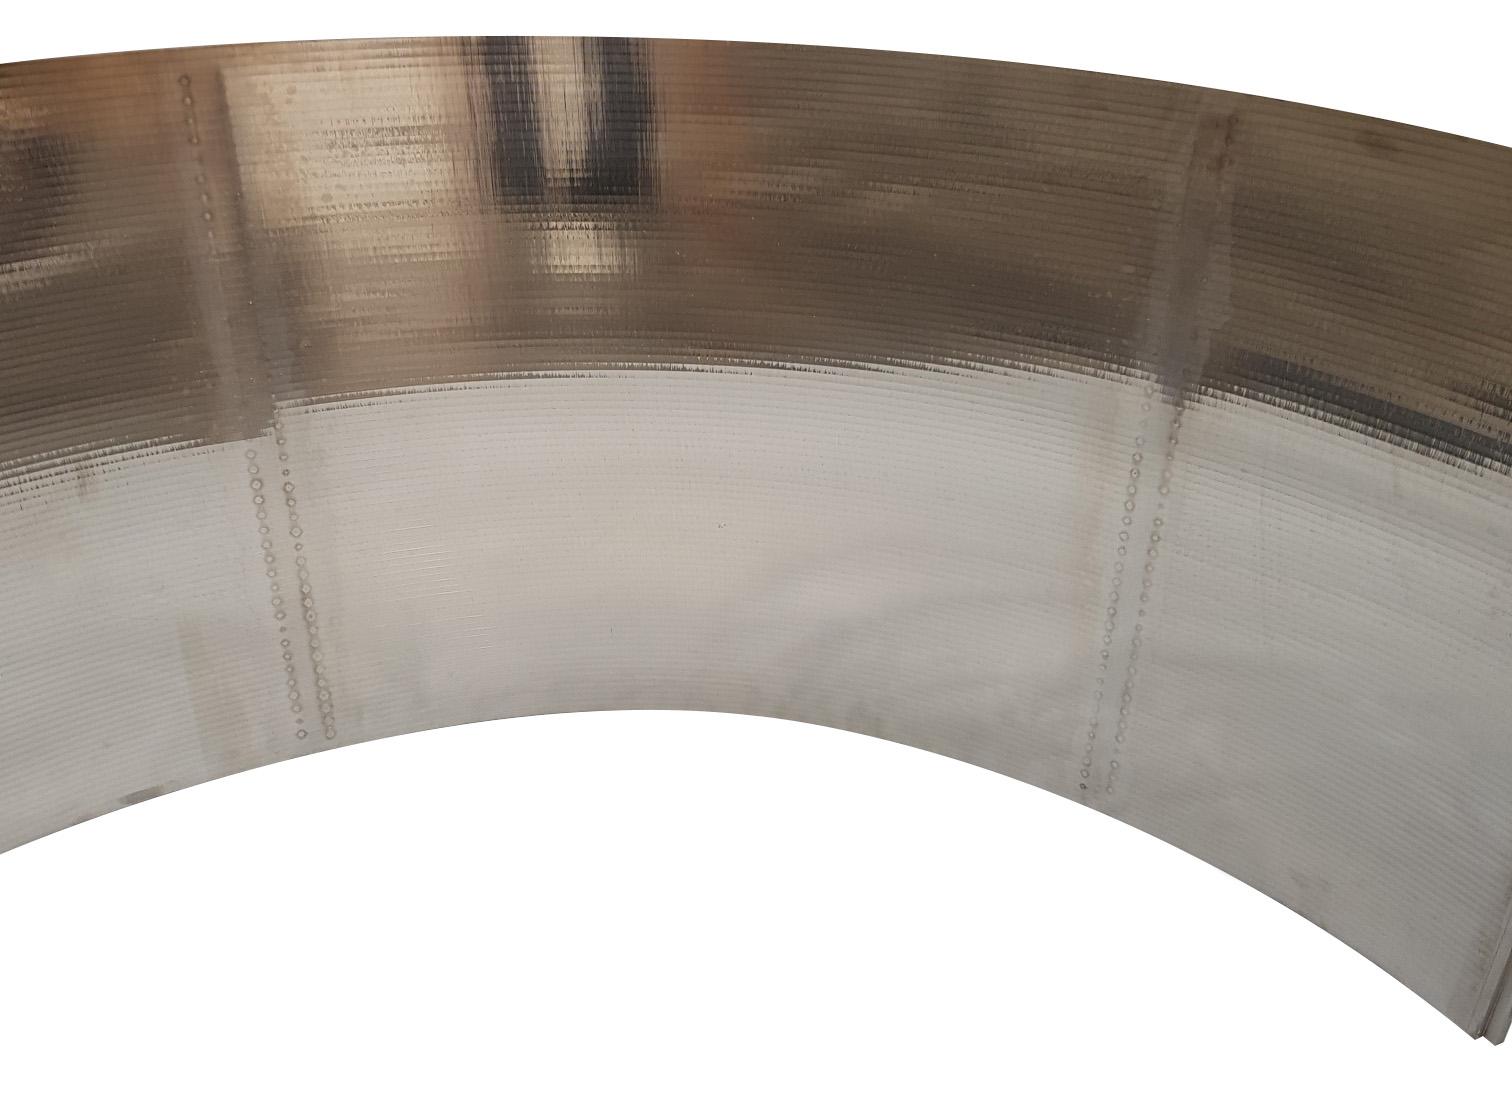 Paper pulp processing